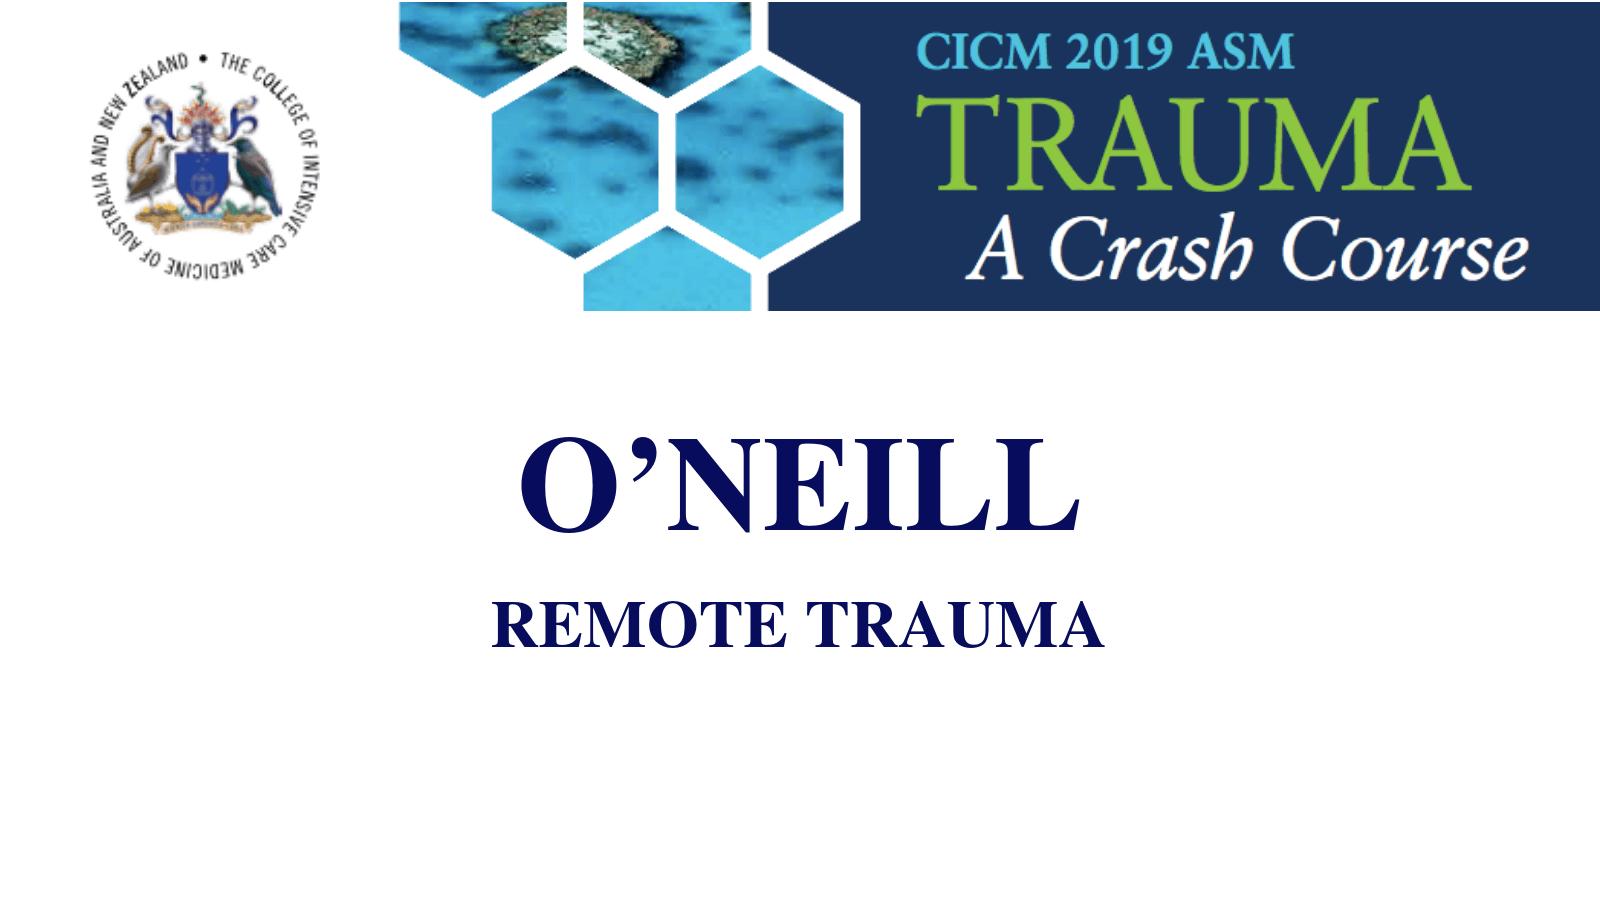 remote trauma